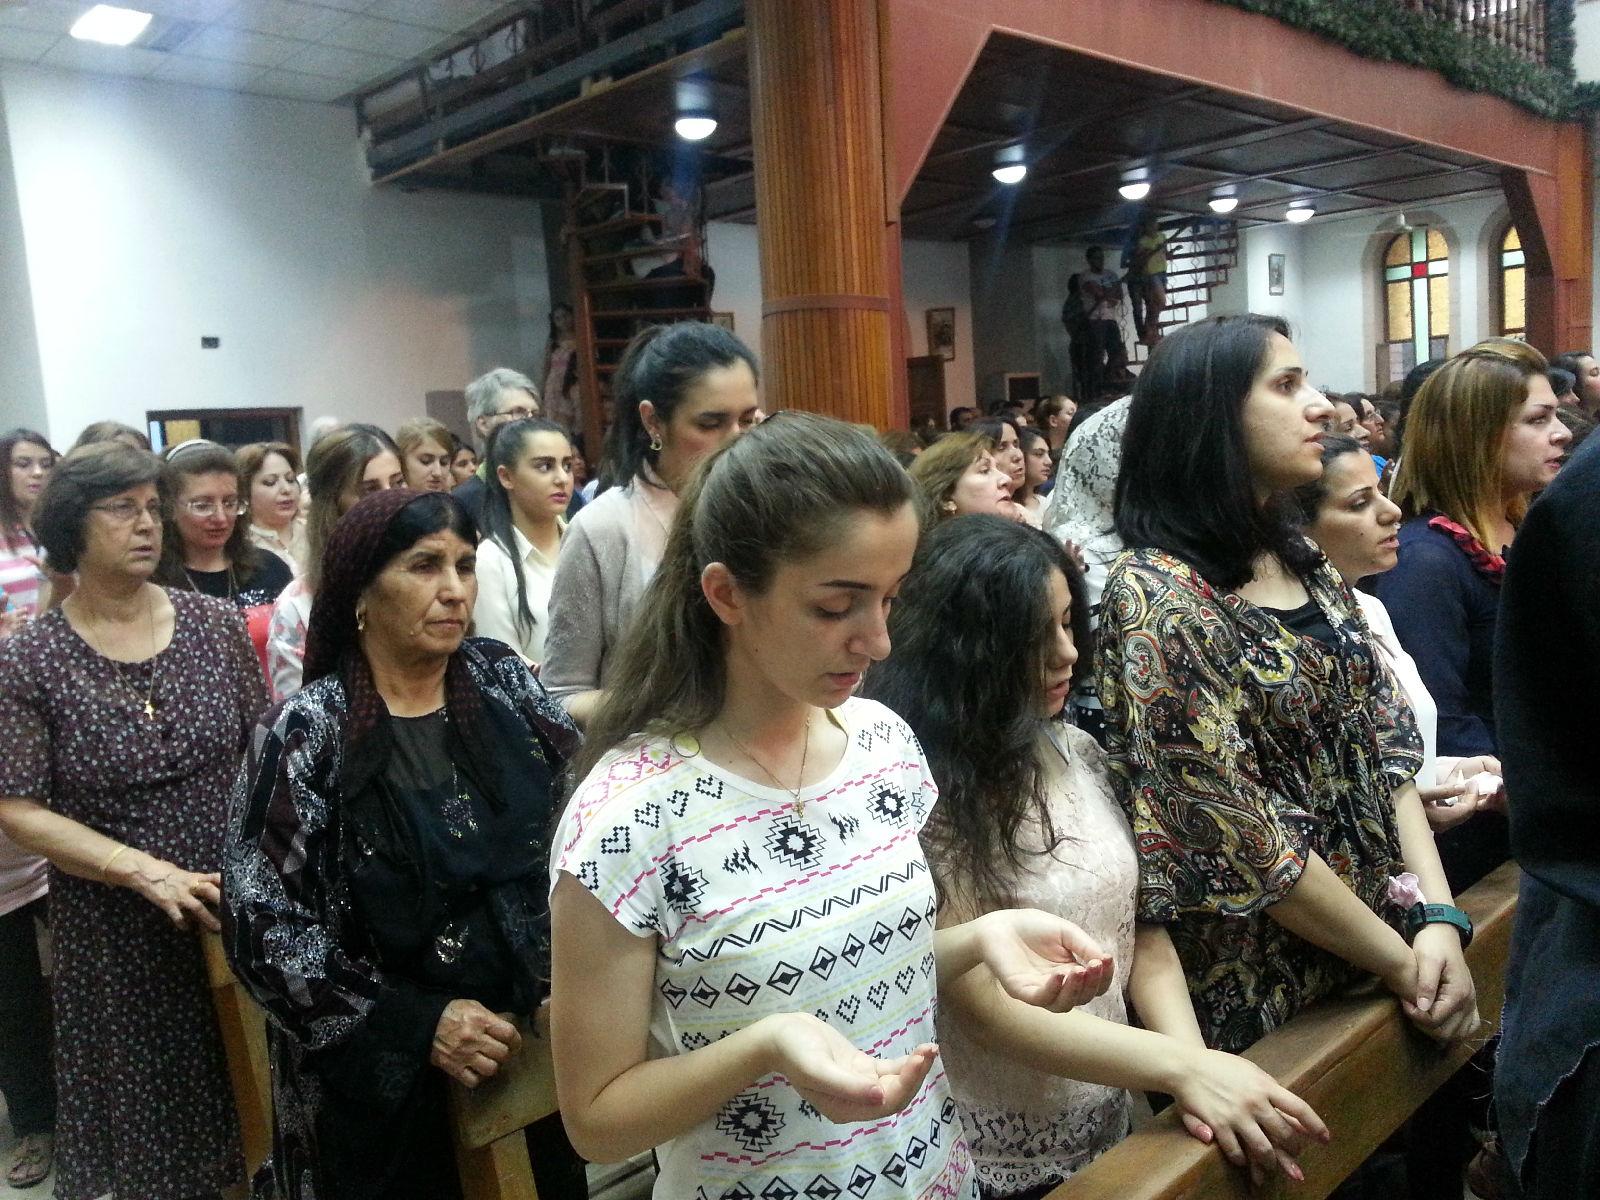 Iraqi christians united in prayer